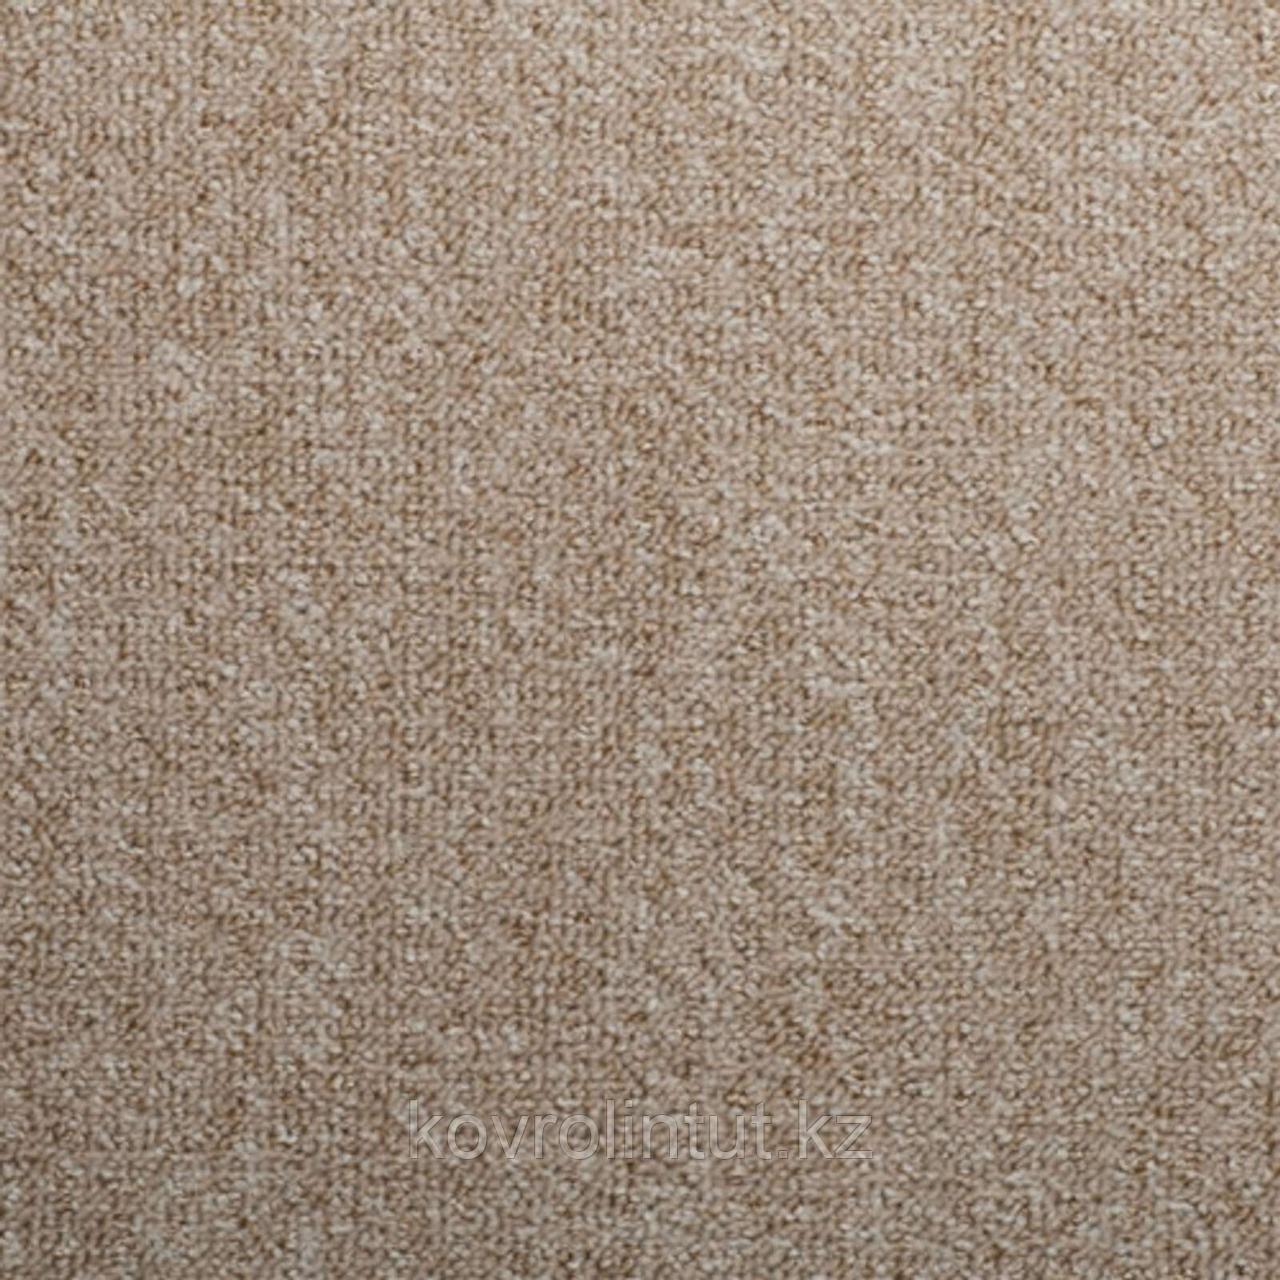 Покрытие ковровое Forza New 3912, 4 м, бежевый, 100%PP